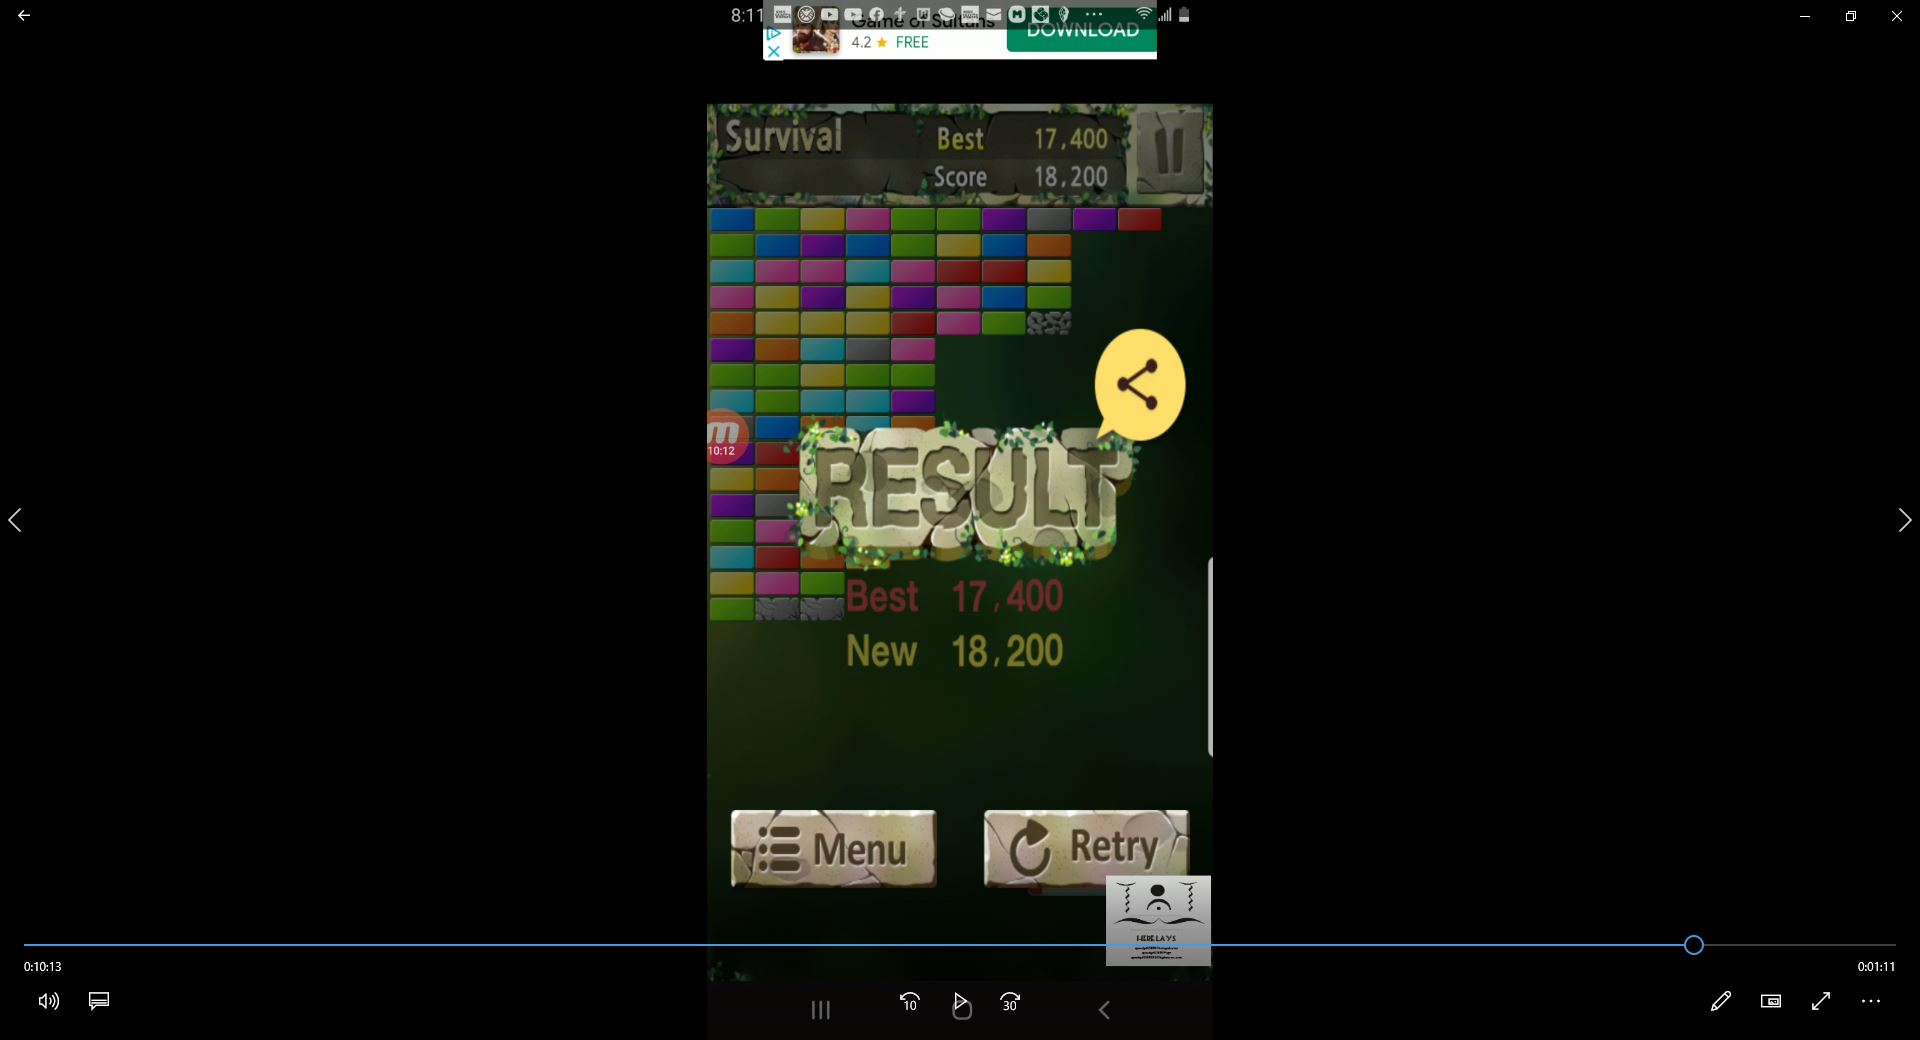 speedy4759123: Bricks Breaker King: Survival (Android) 18,200 points on 2020-04-06 20:12:59